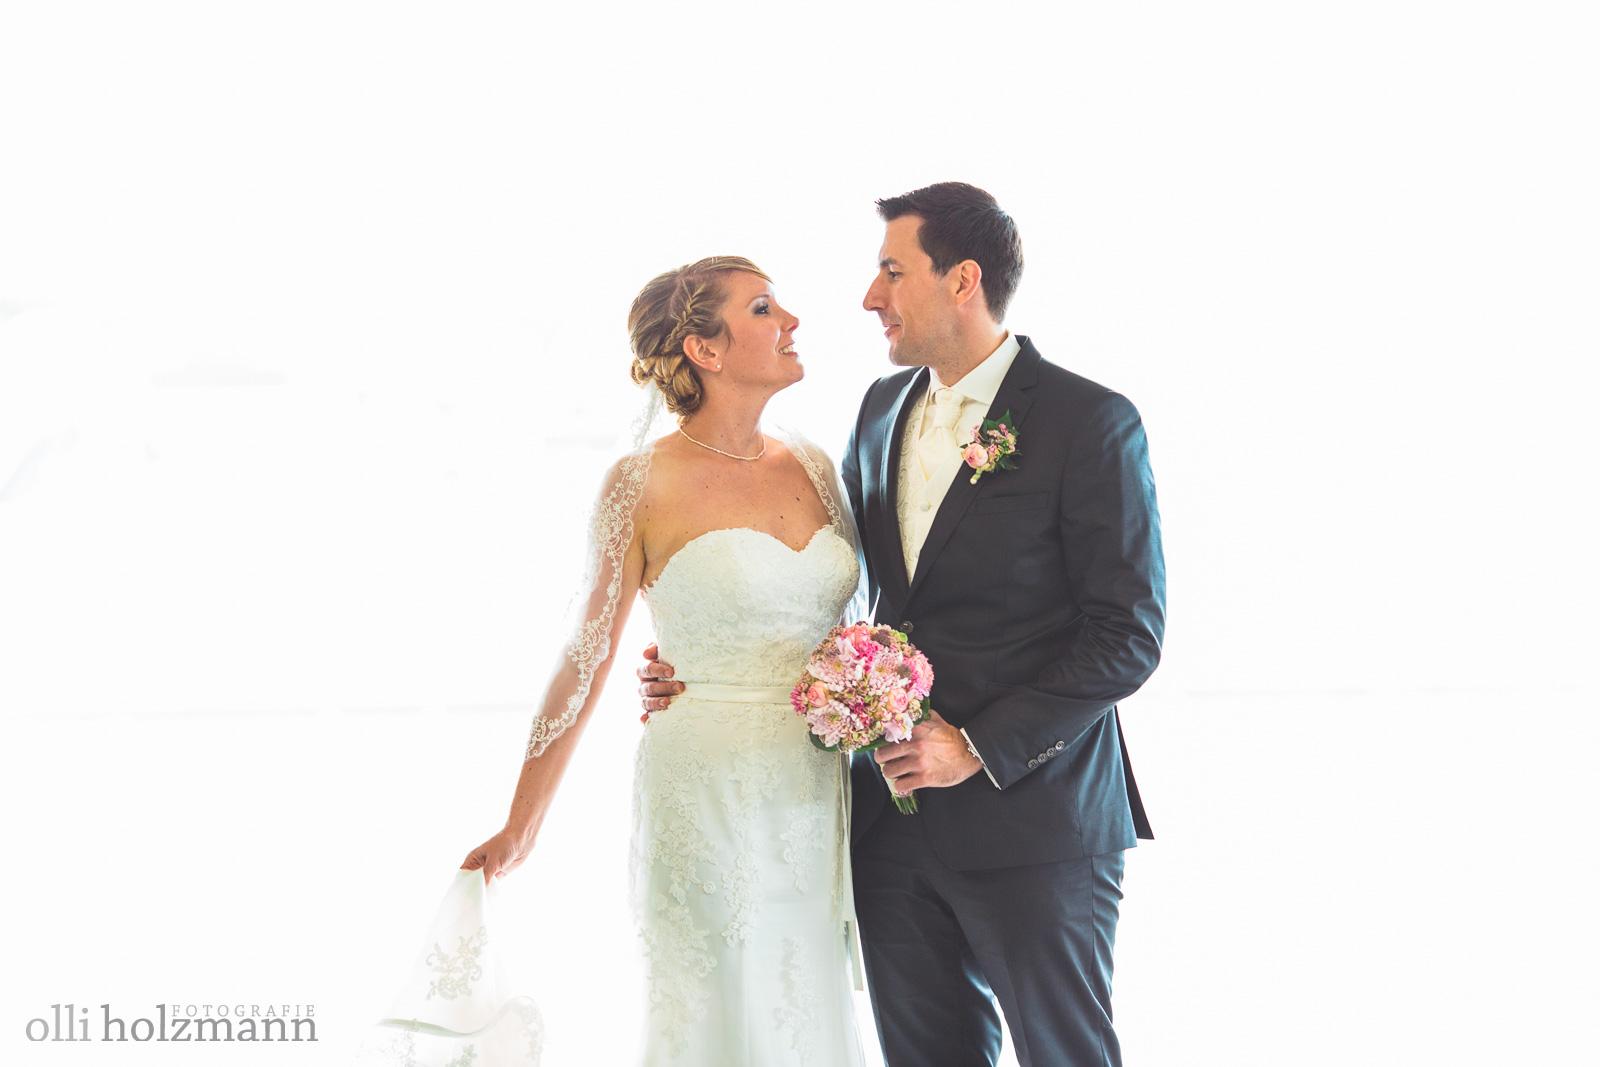 Hochzeitsfotograf nrw-64.jpg